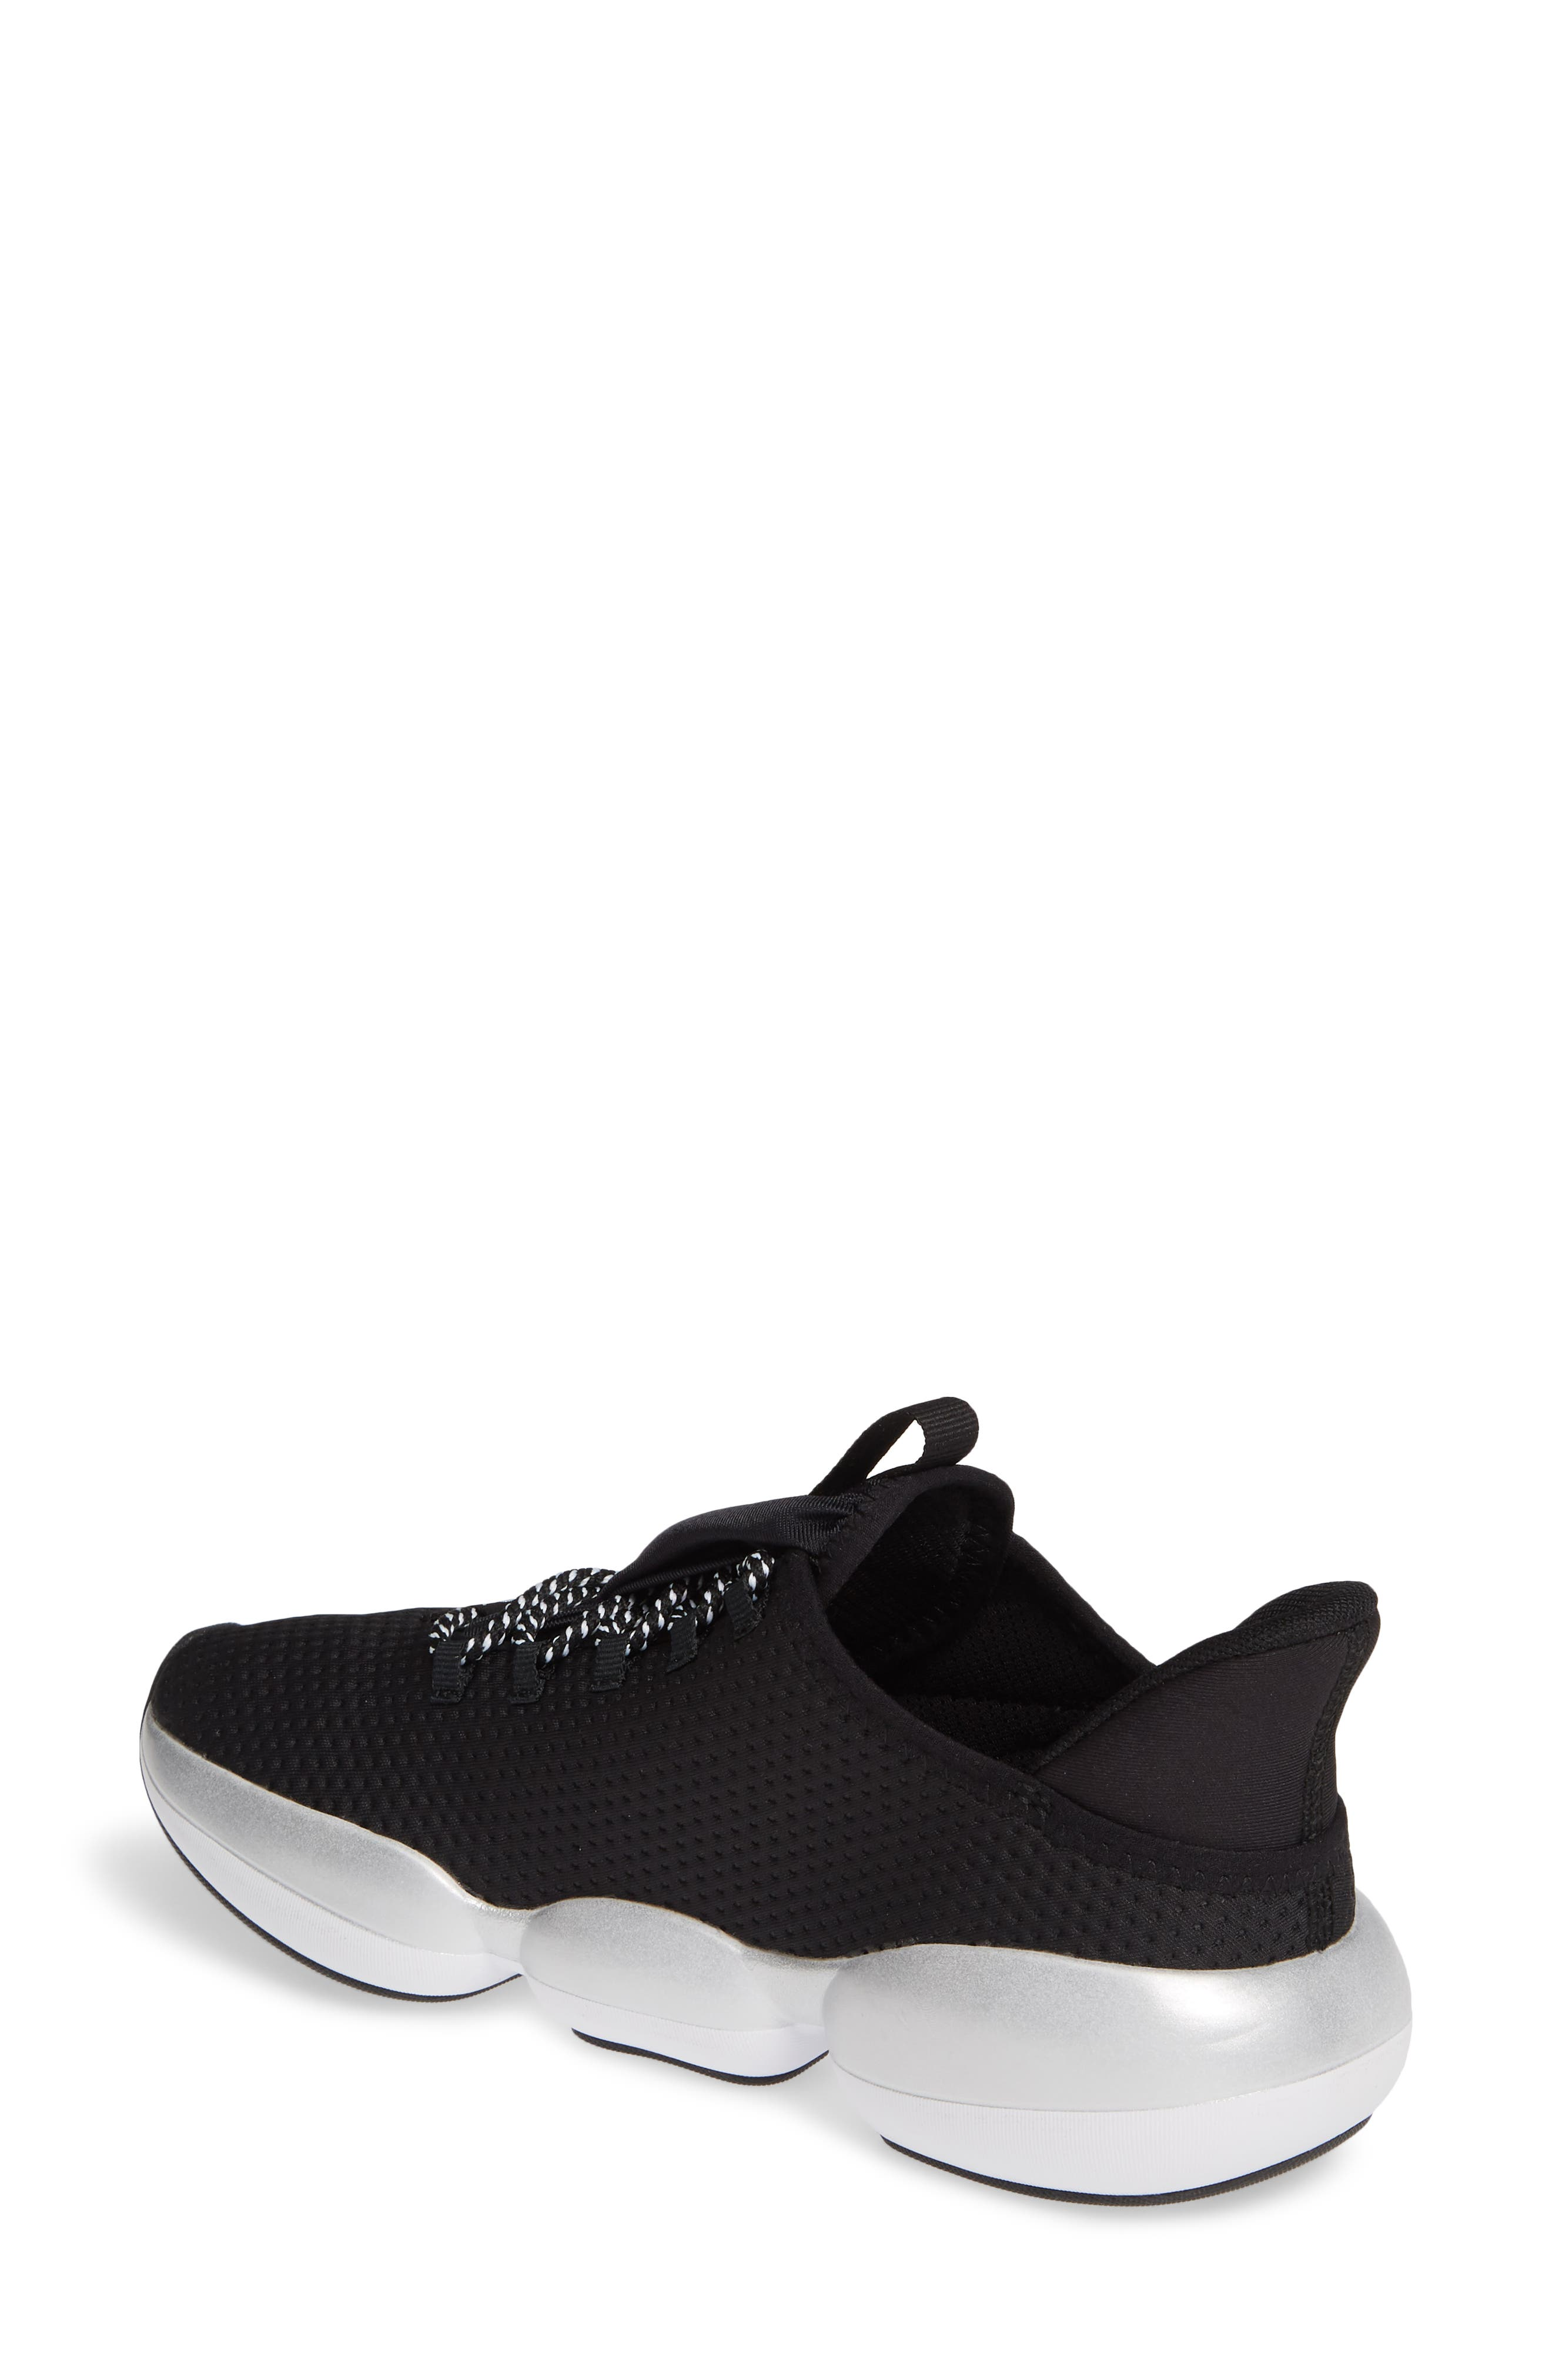 PUMA Shoes for Women  4013054c2